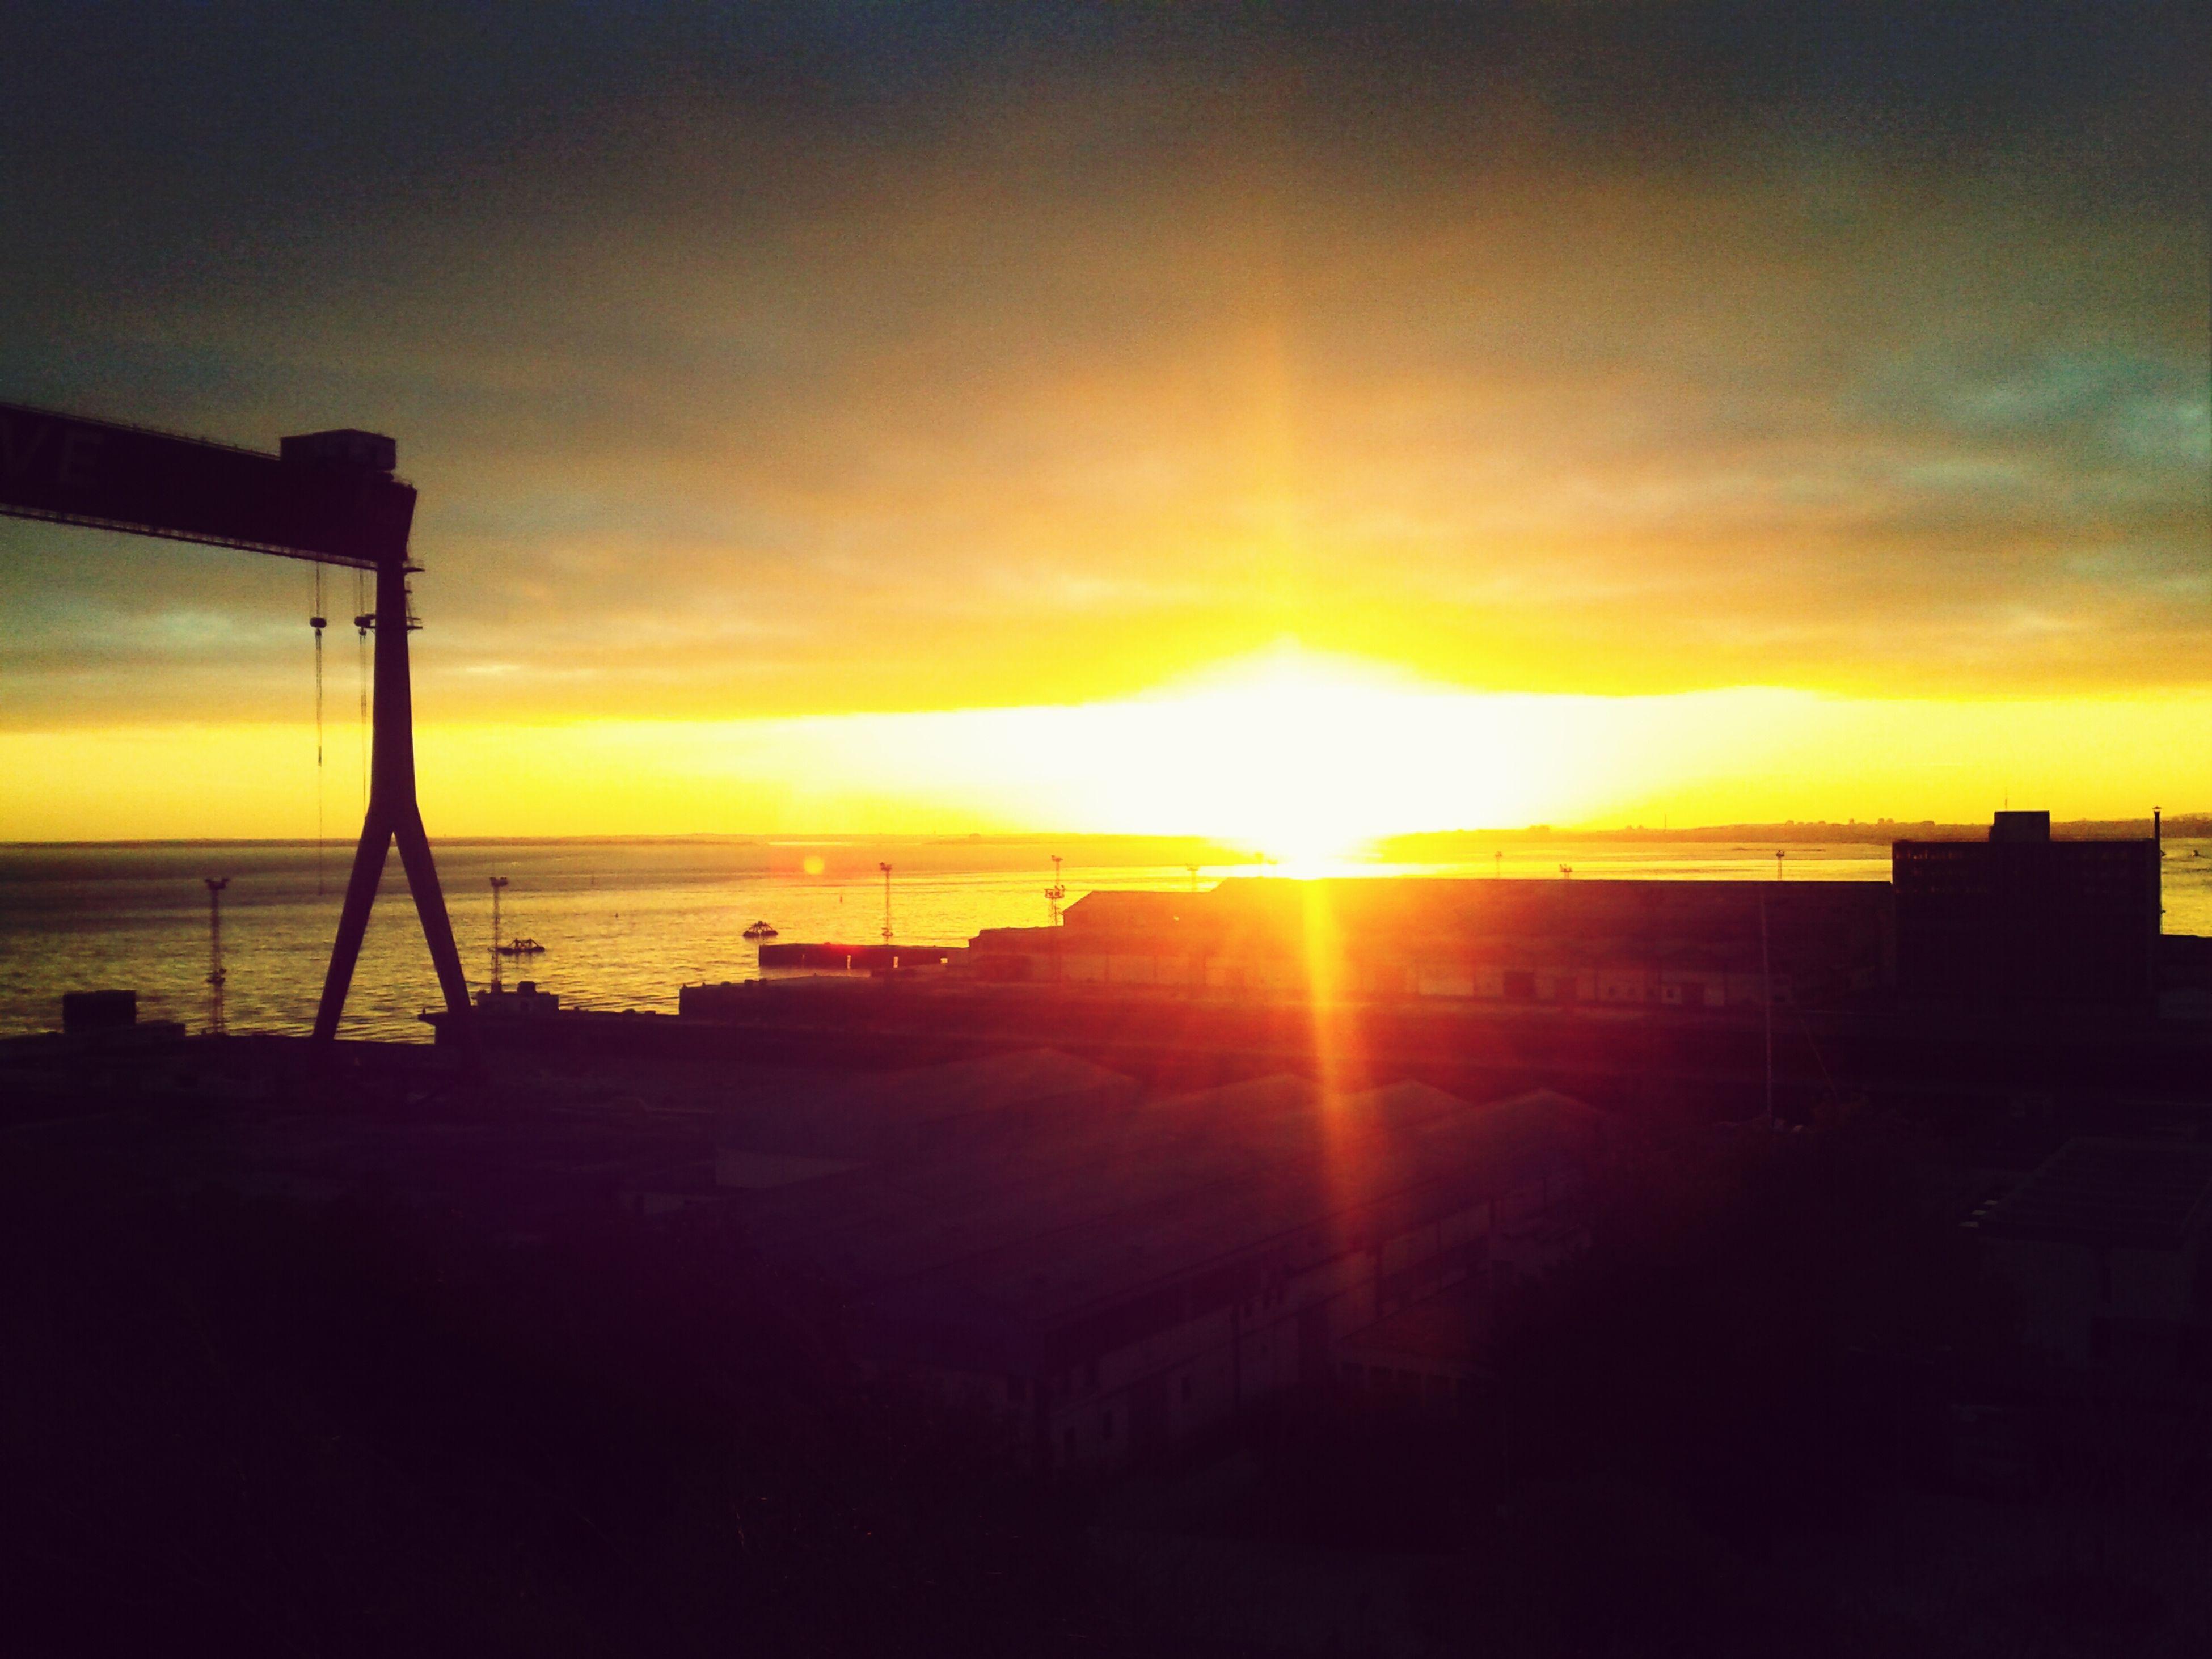 sunset, sun, sea, horizon over water, silhouette, sky, orange color, scenics, water, beauty in nature, sunlight, tranquil scene, tranquility, idyllic, sunbeam, cloud - sky, built structure, nature, architecture, beach